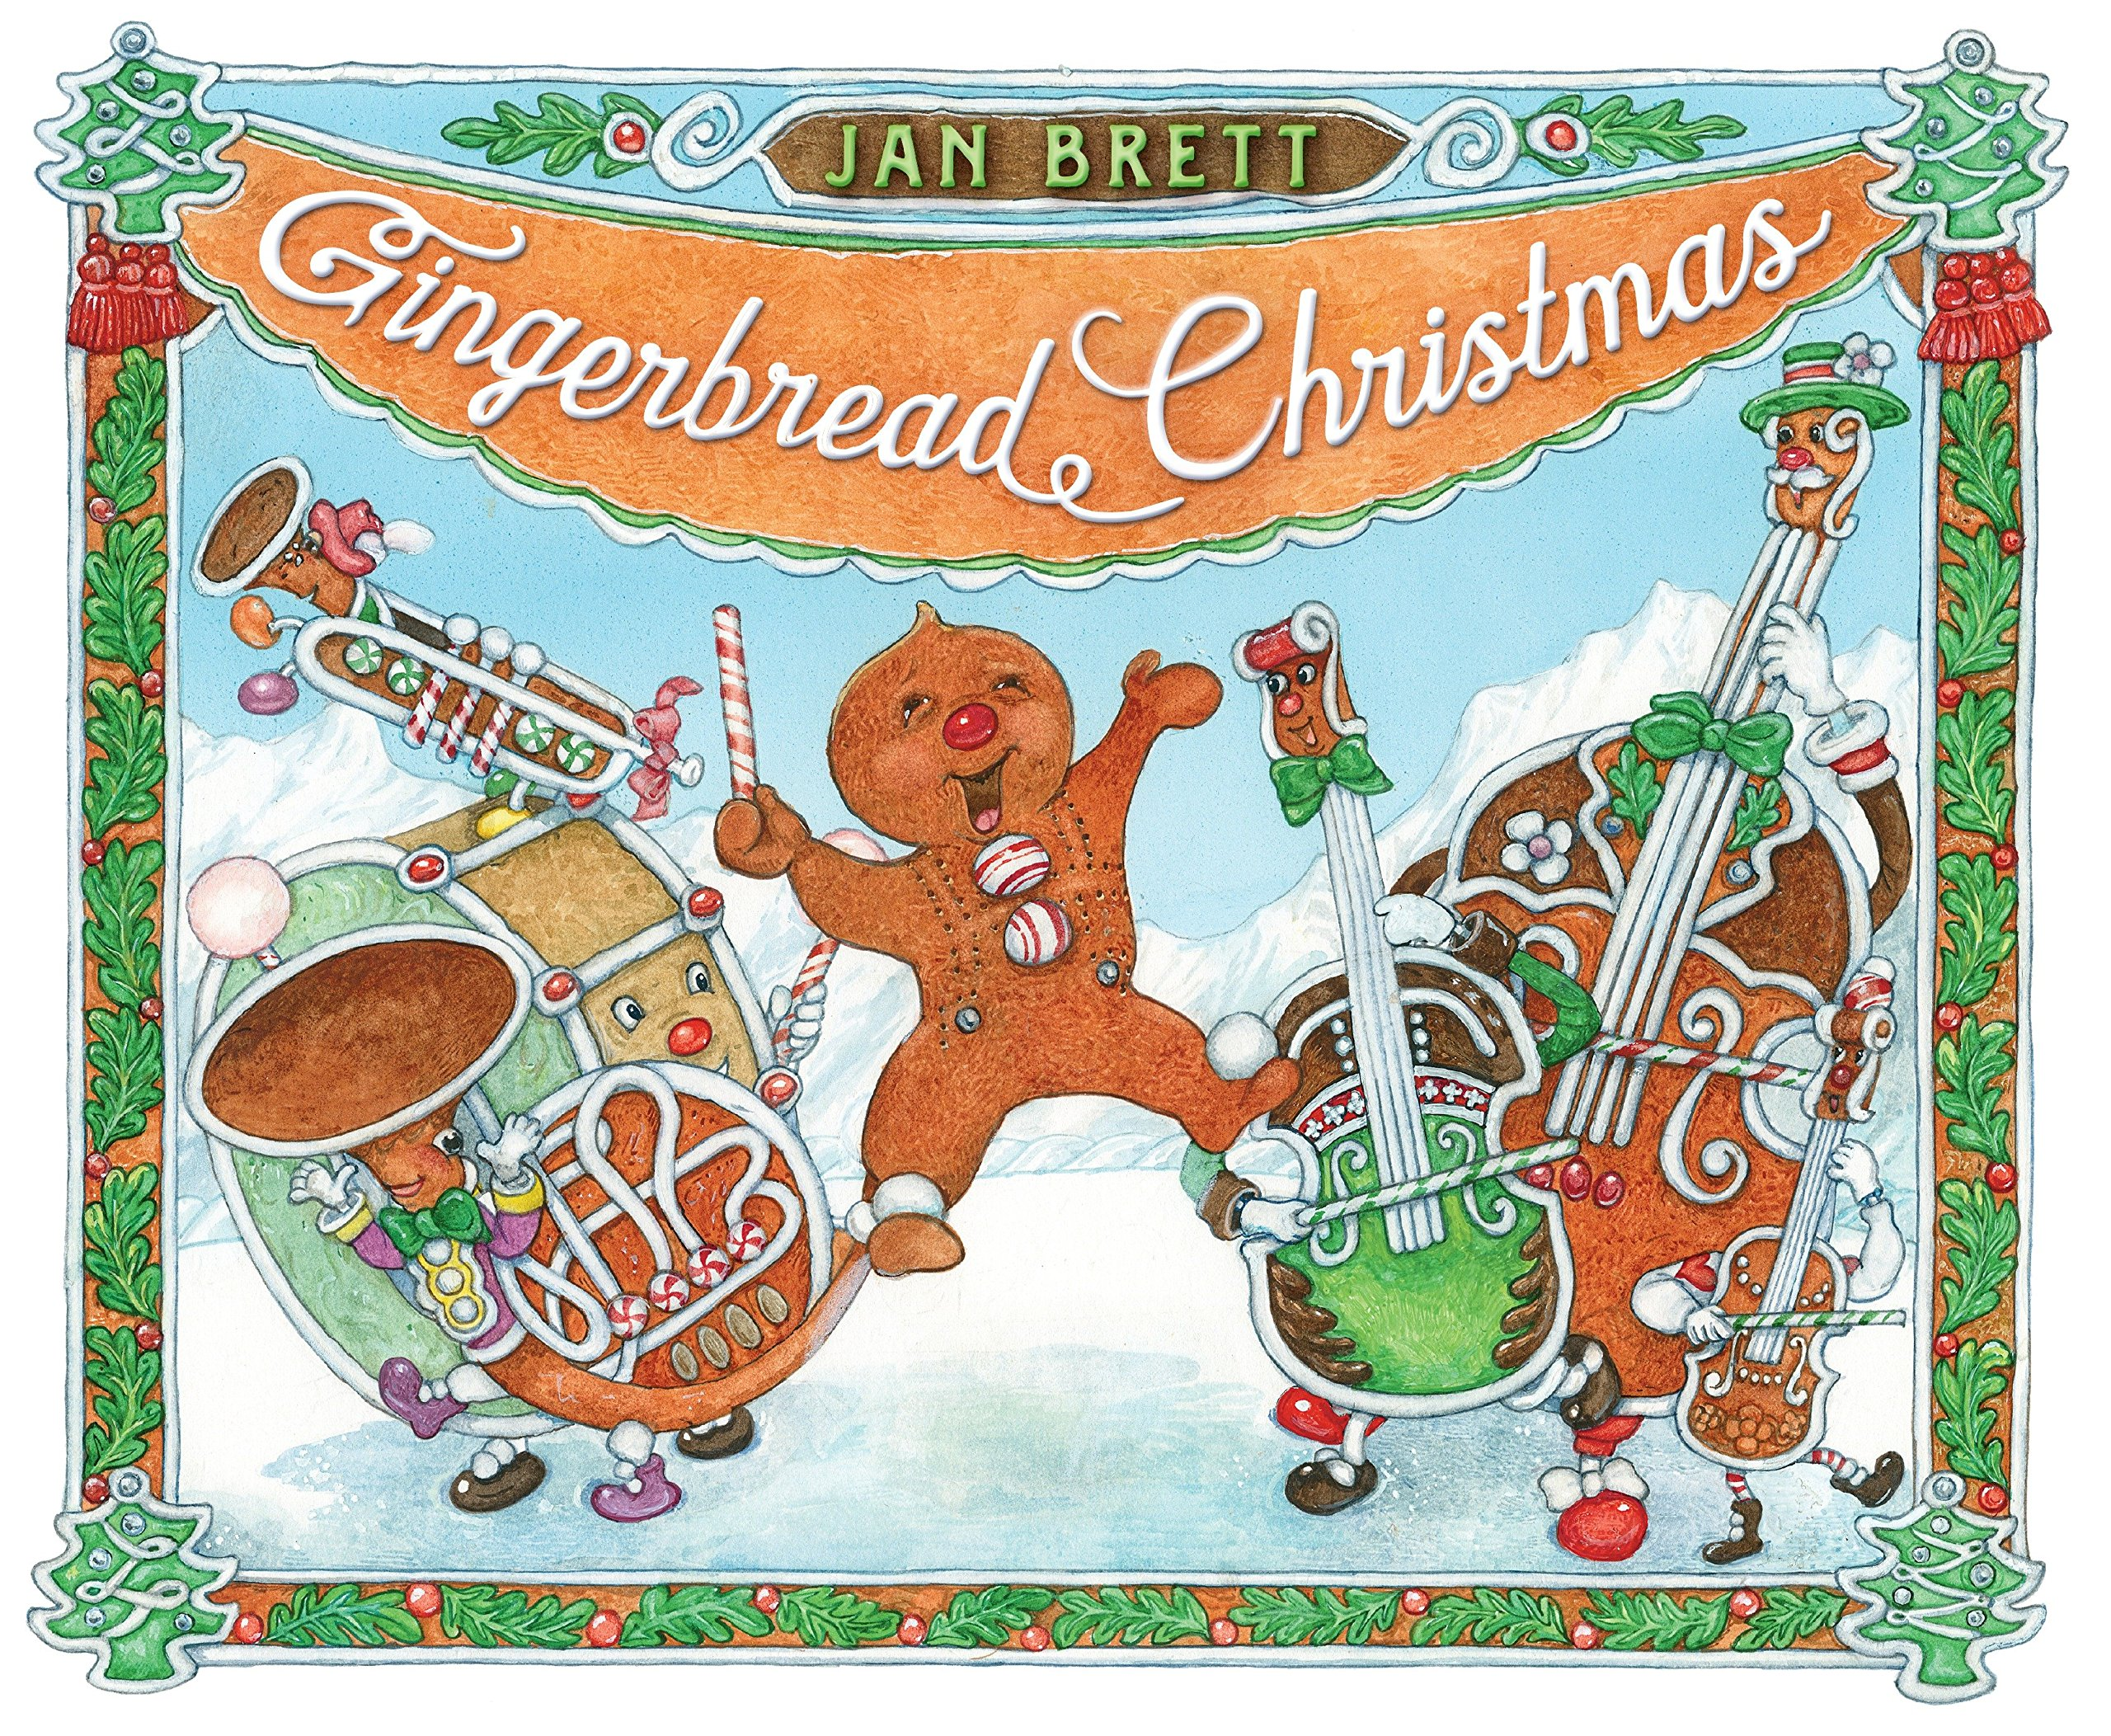 Amazon.com: Gingerbread Christmas (9780399170713): Jan Brett: Books